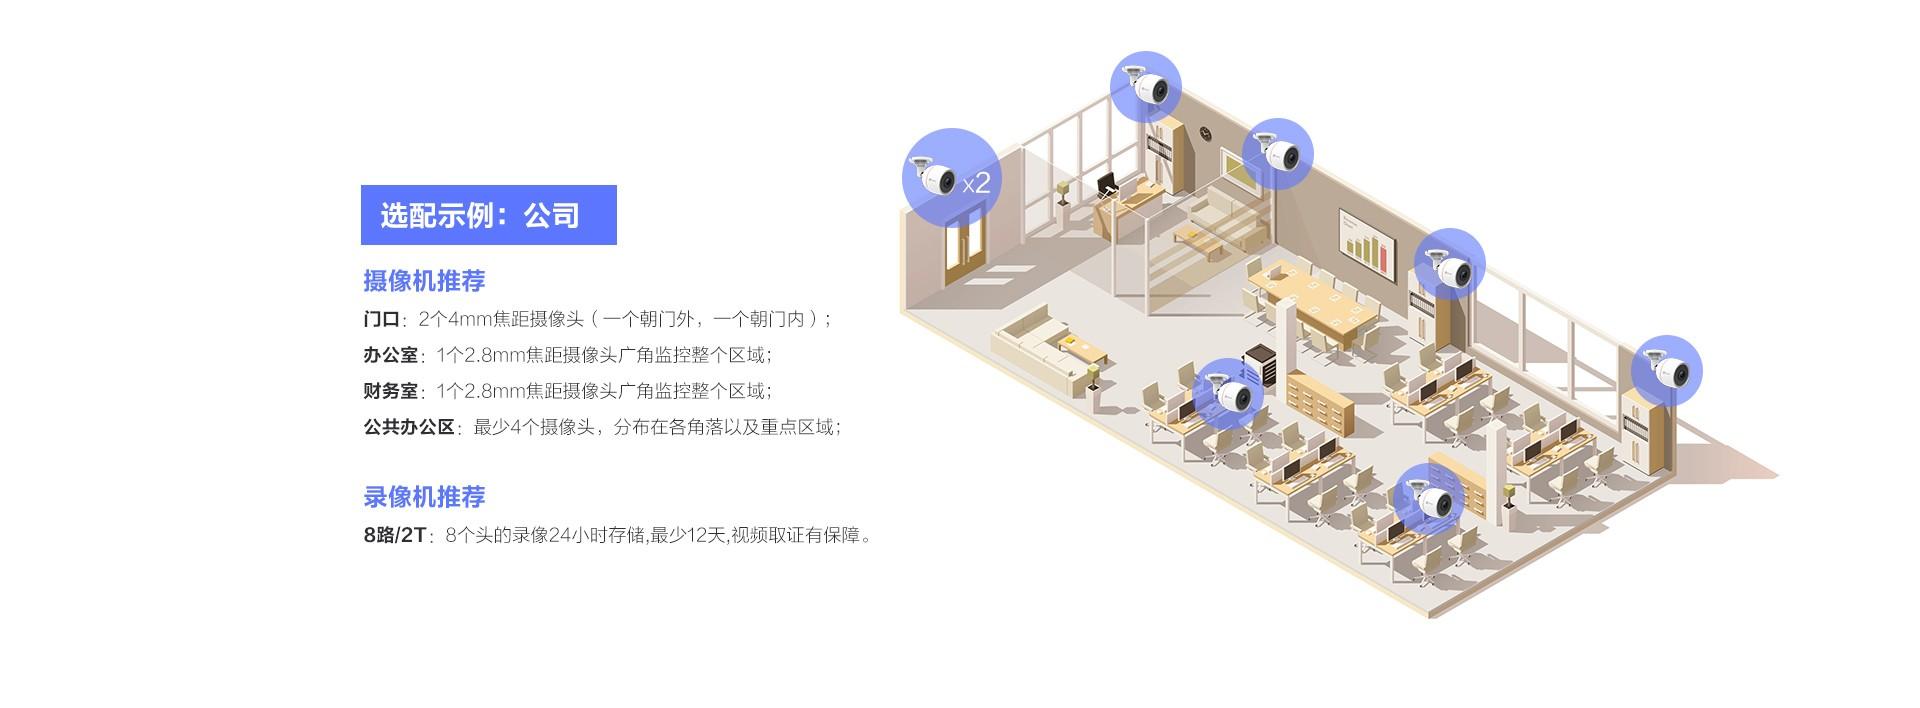 C3T+X5SC-web_20.jpg